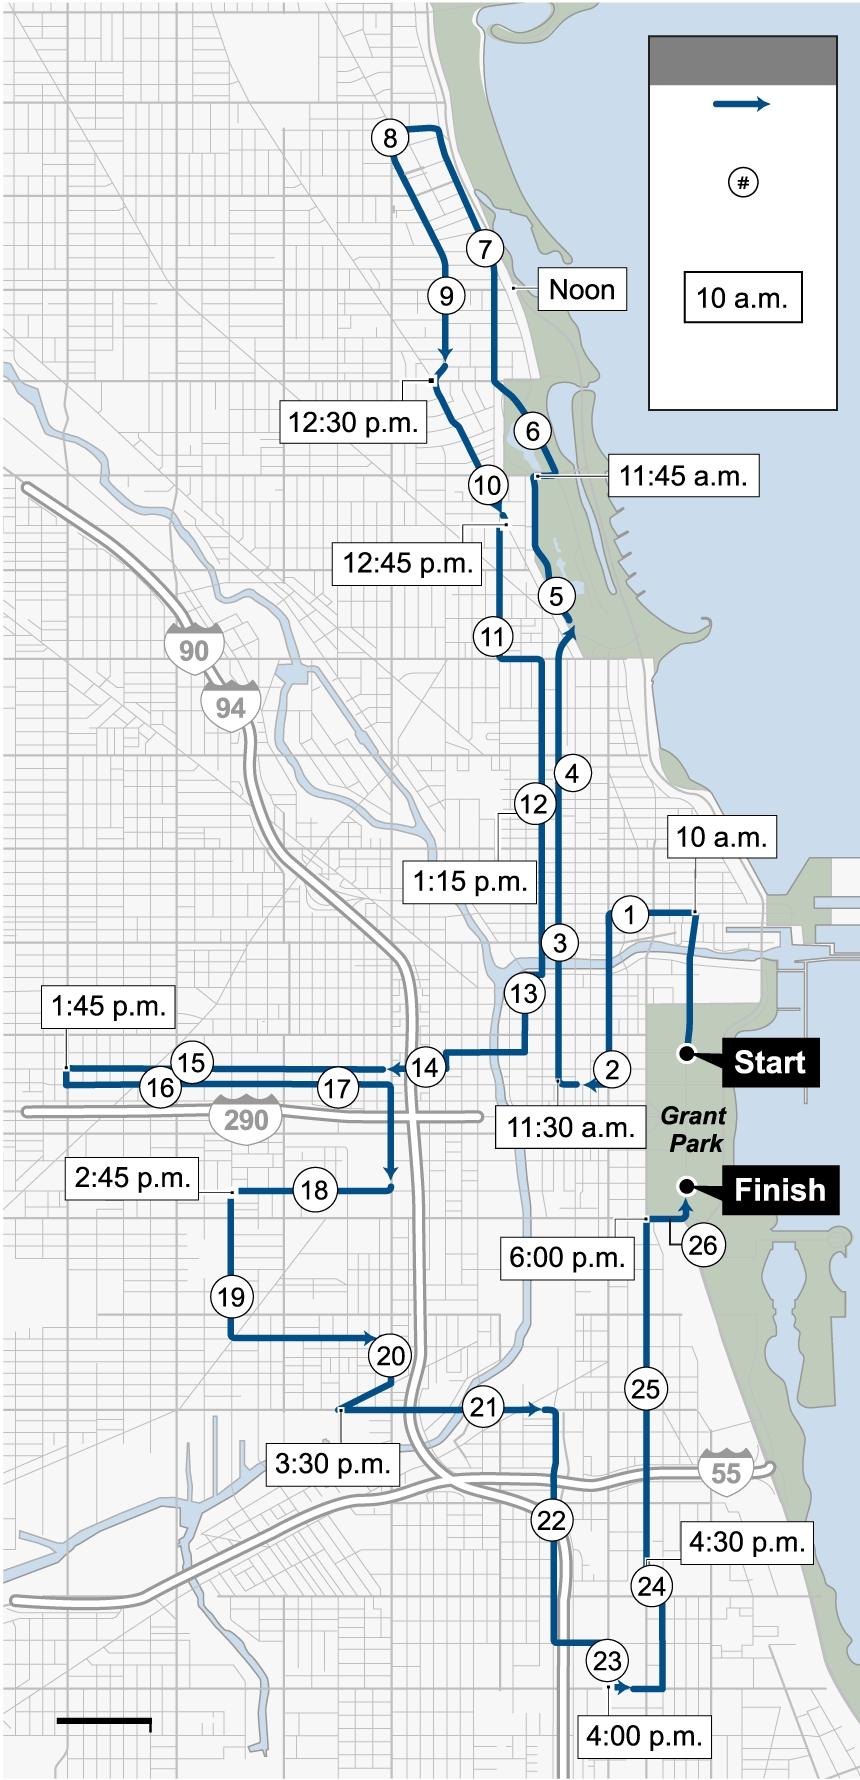 Chicago Marathon 2019: Course Map, Where To Watch The Race inside Chicago Marathon Map 2019